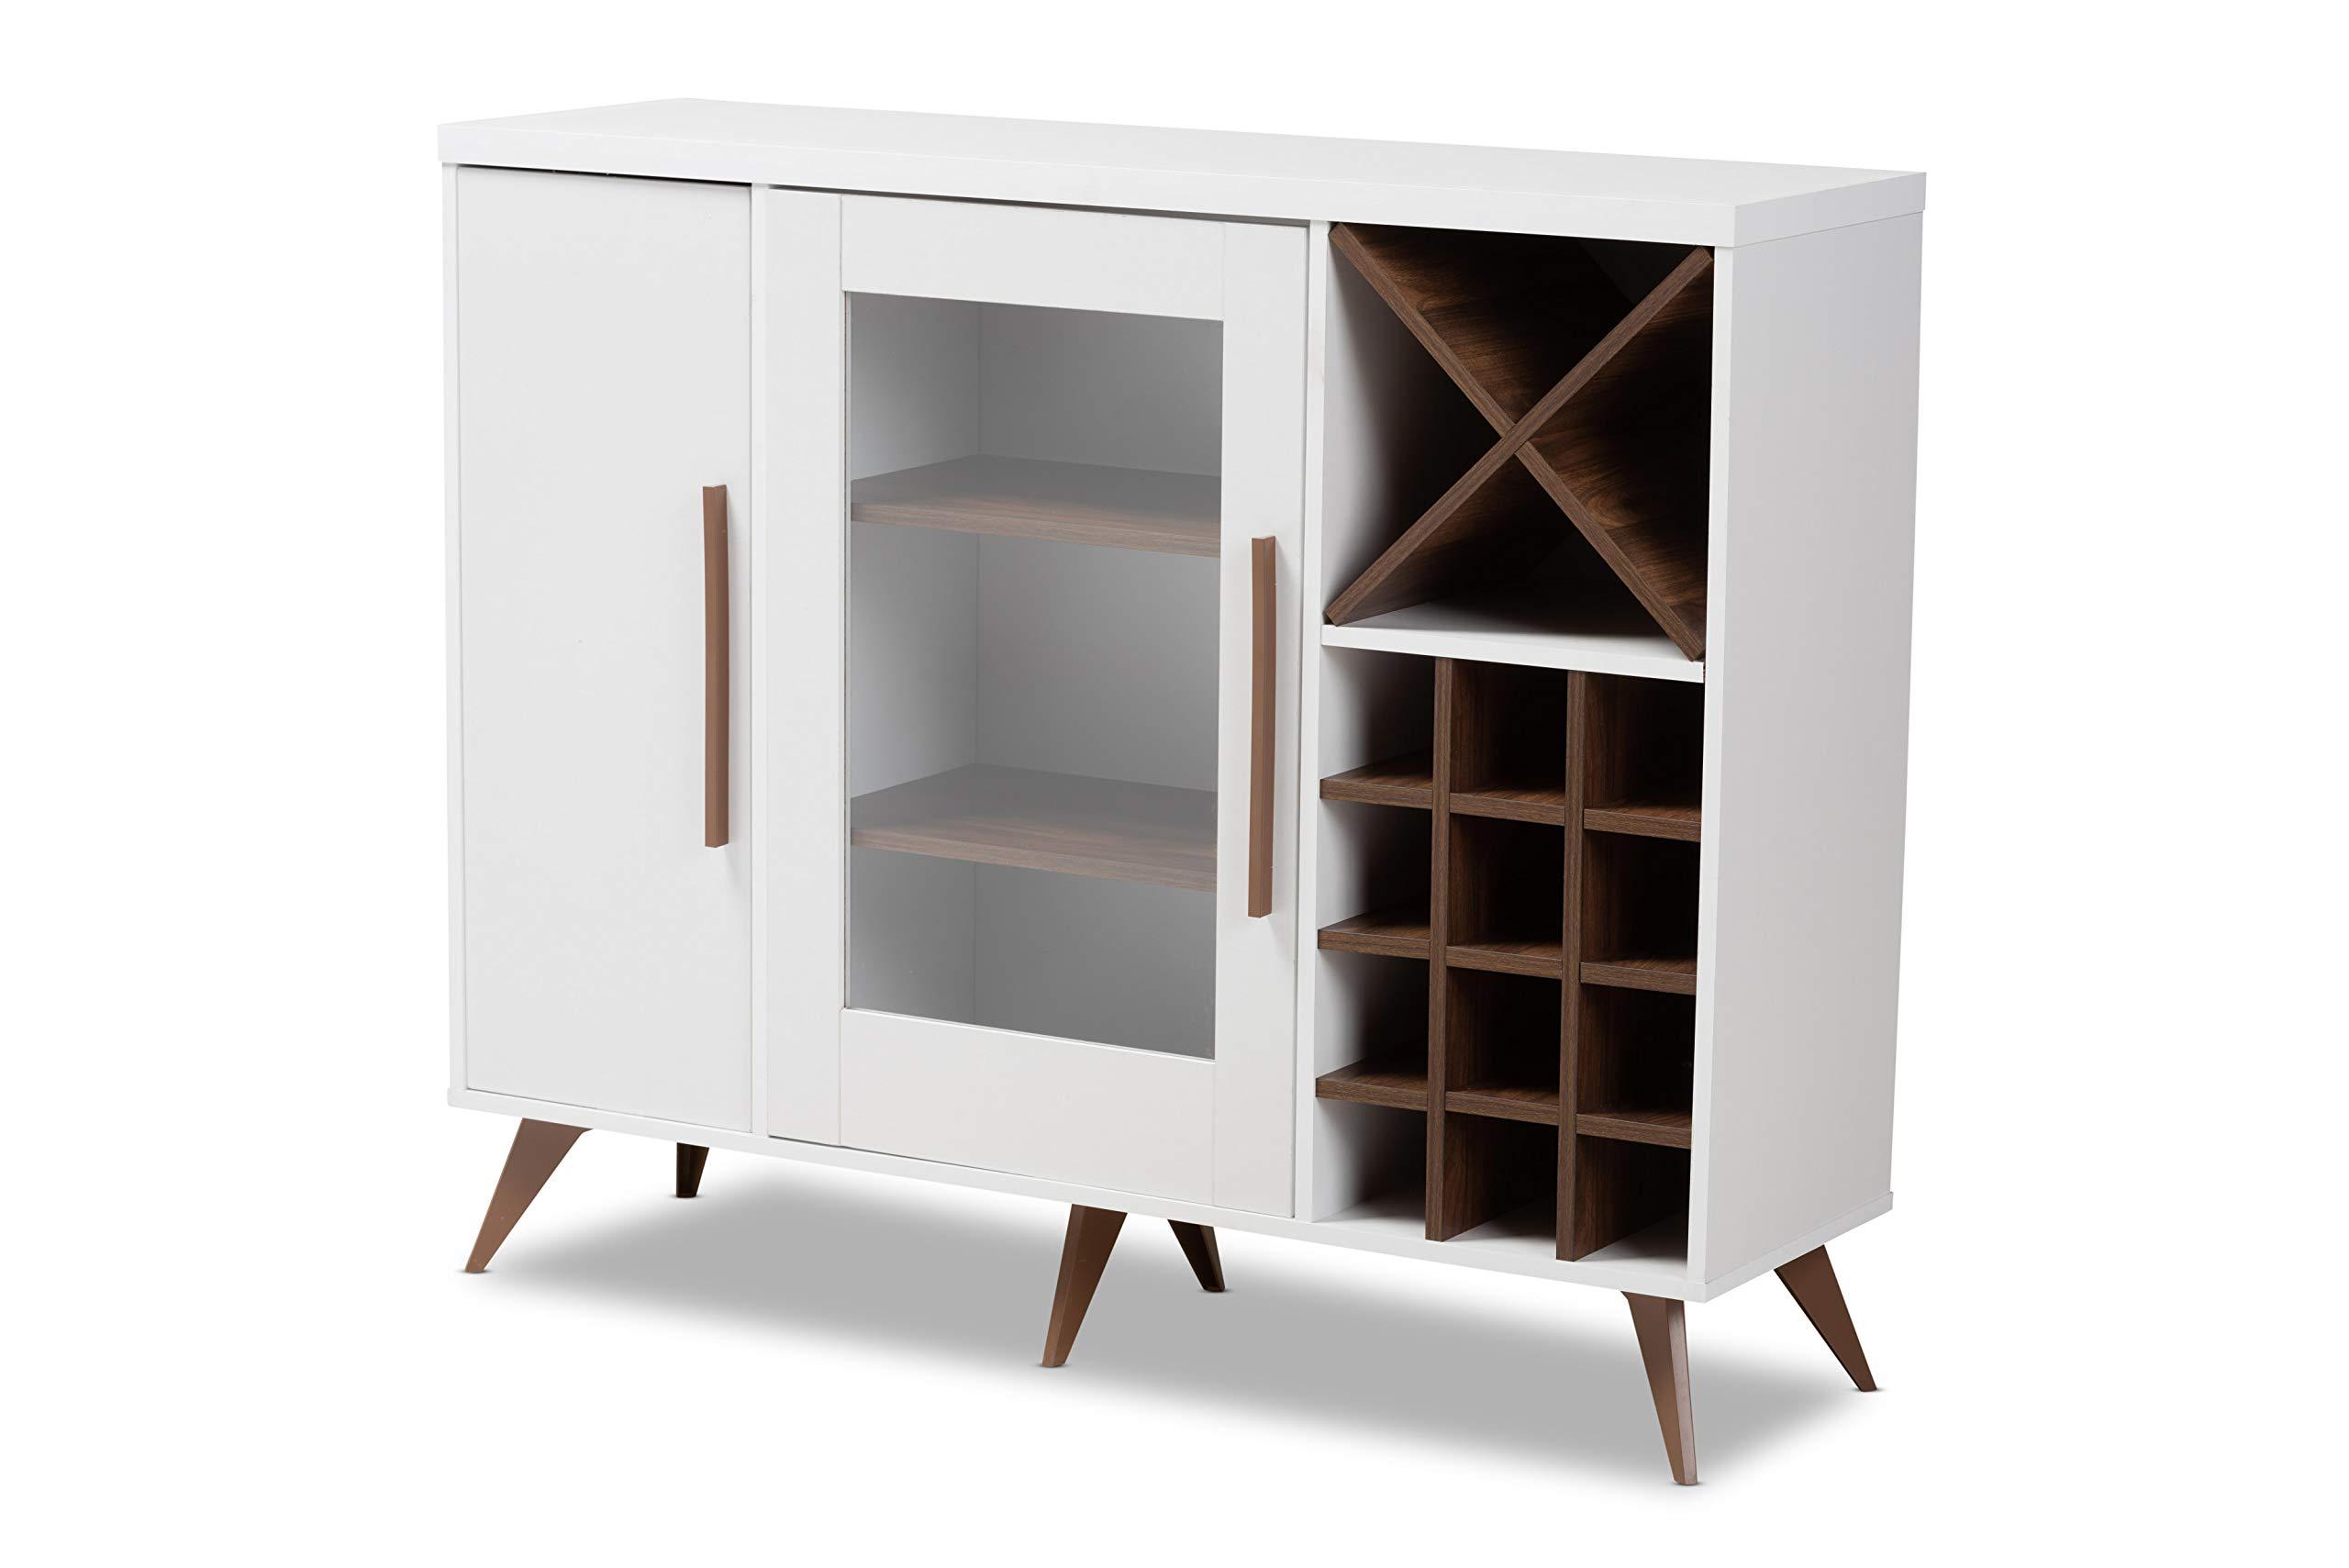 Baxton Studio Wine Cabinets, White by Baxton Studio